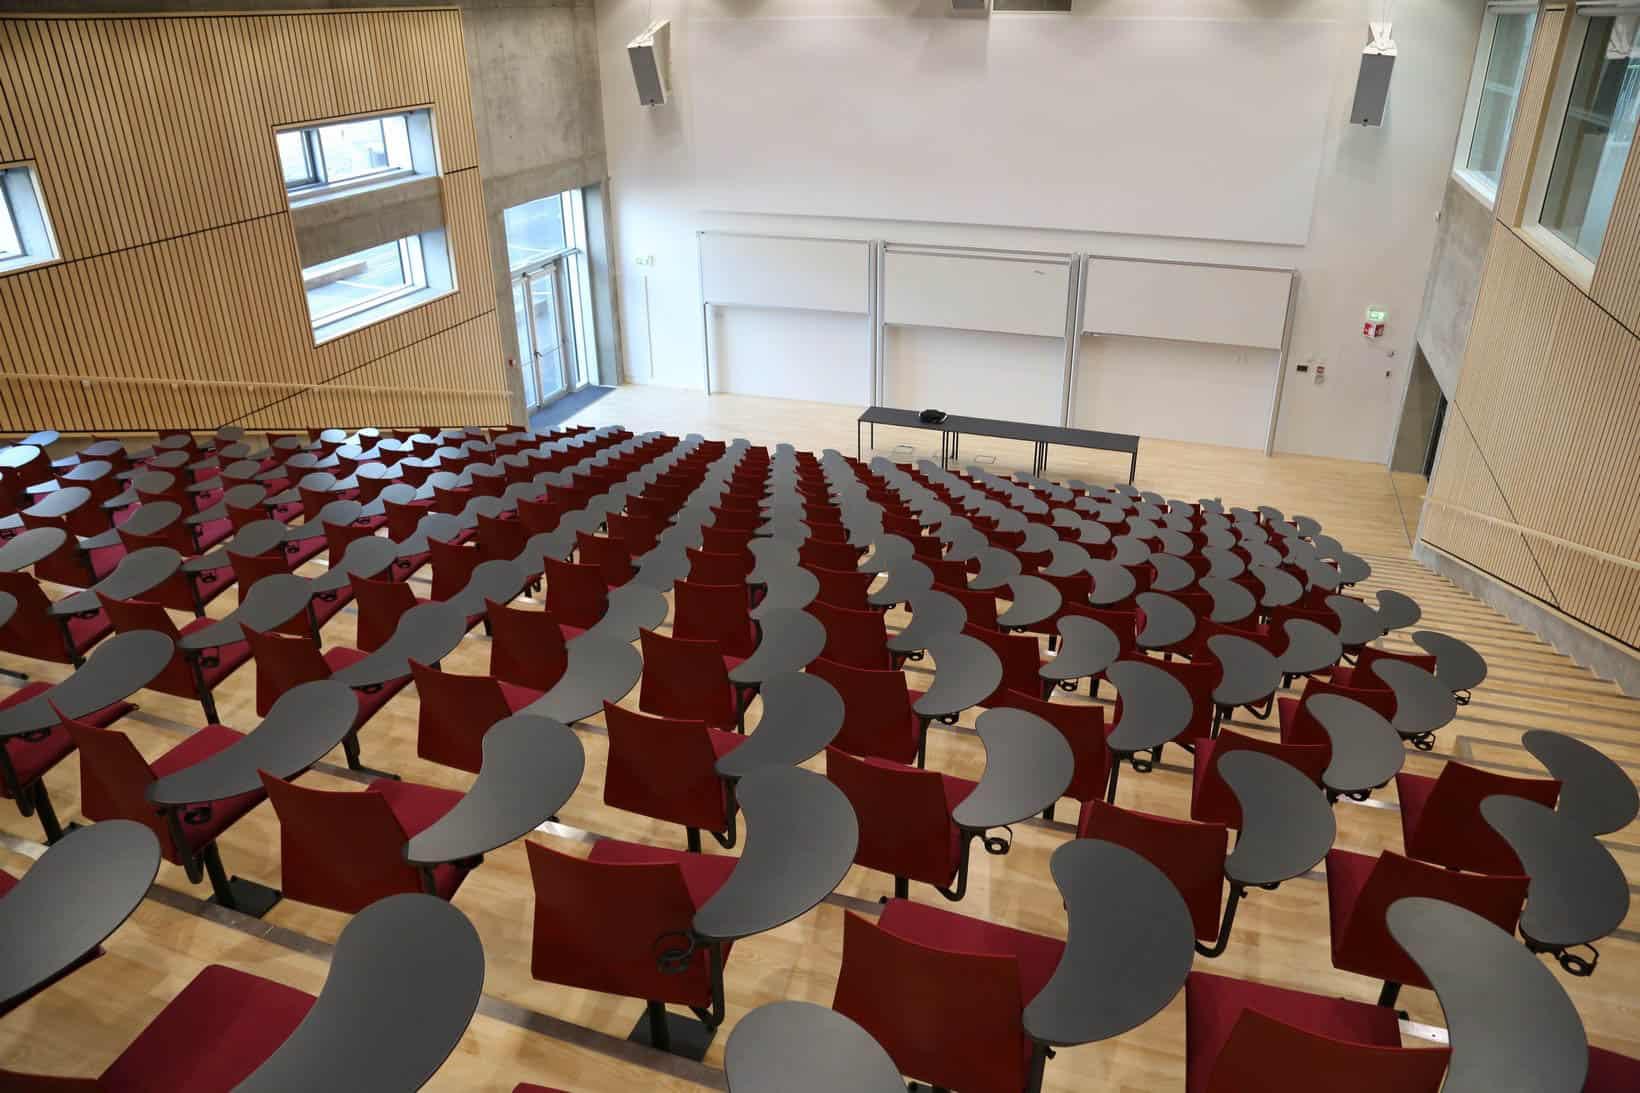 FOURDESIGN FOURSURE chaise auditorium pivotante, mécanisme avec